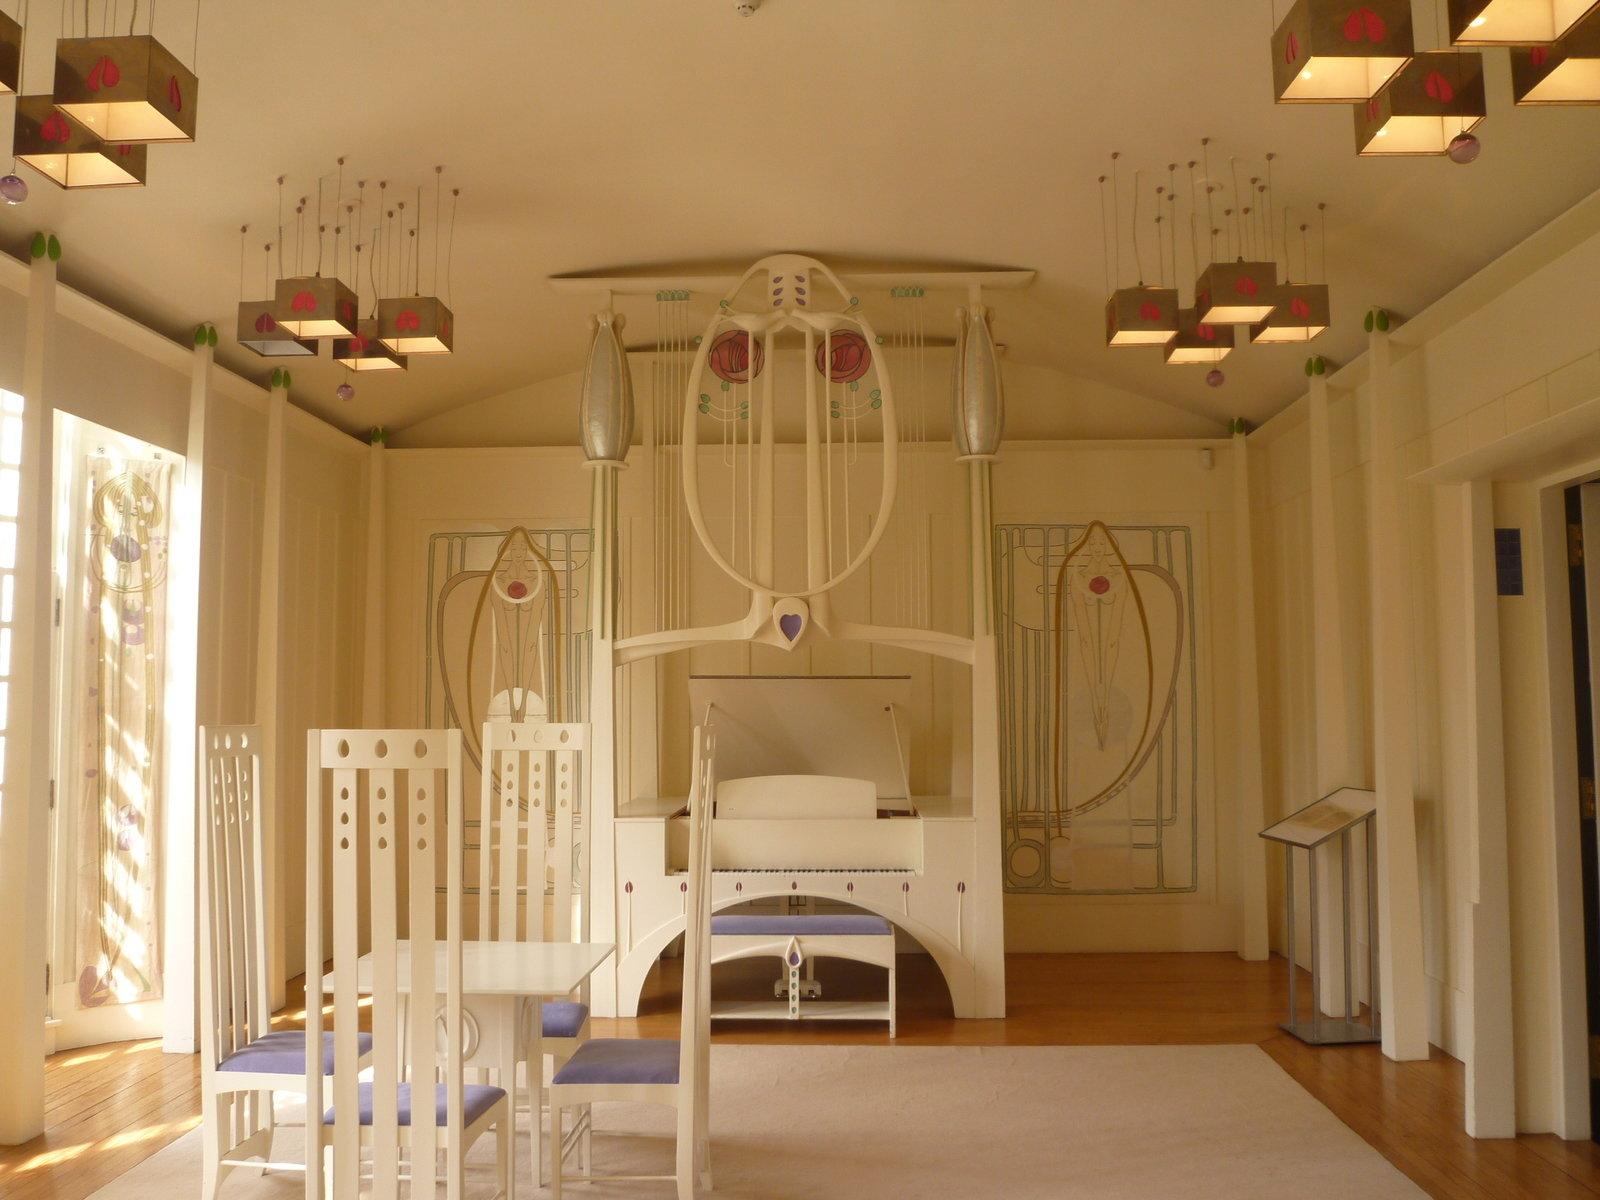 Musikzimmer im House of an Art Lover, Glasgow, 1901, Charles Rennie Mackintosh, Culture Grid, CC BY